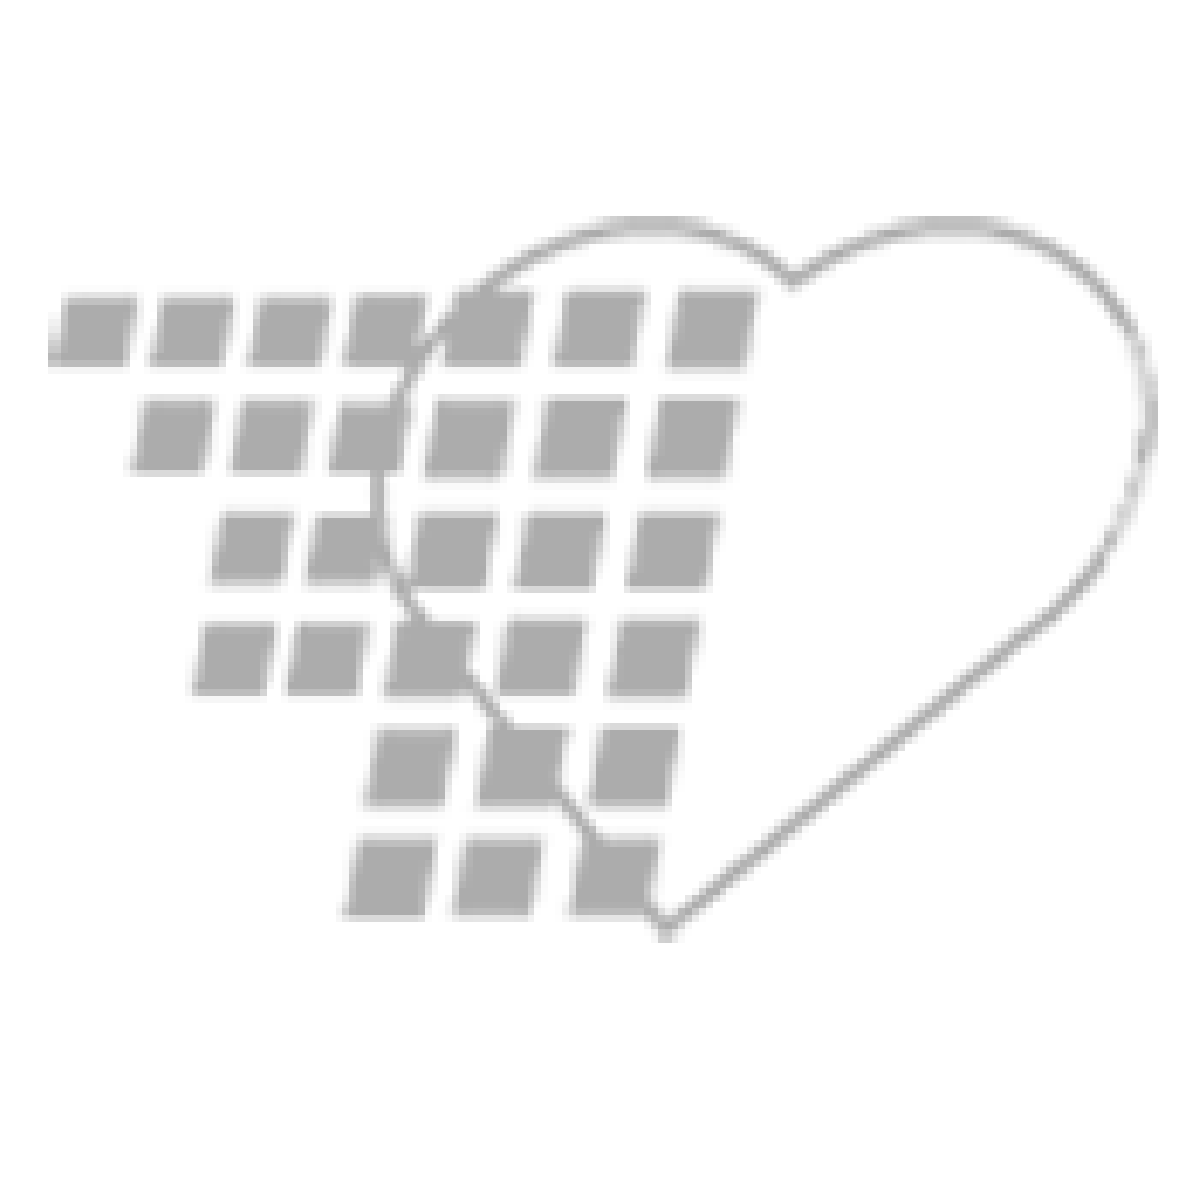 02-99-0051 Prestan Replacement Pads